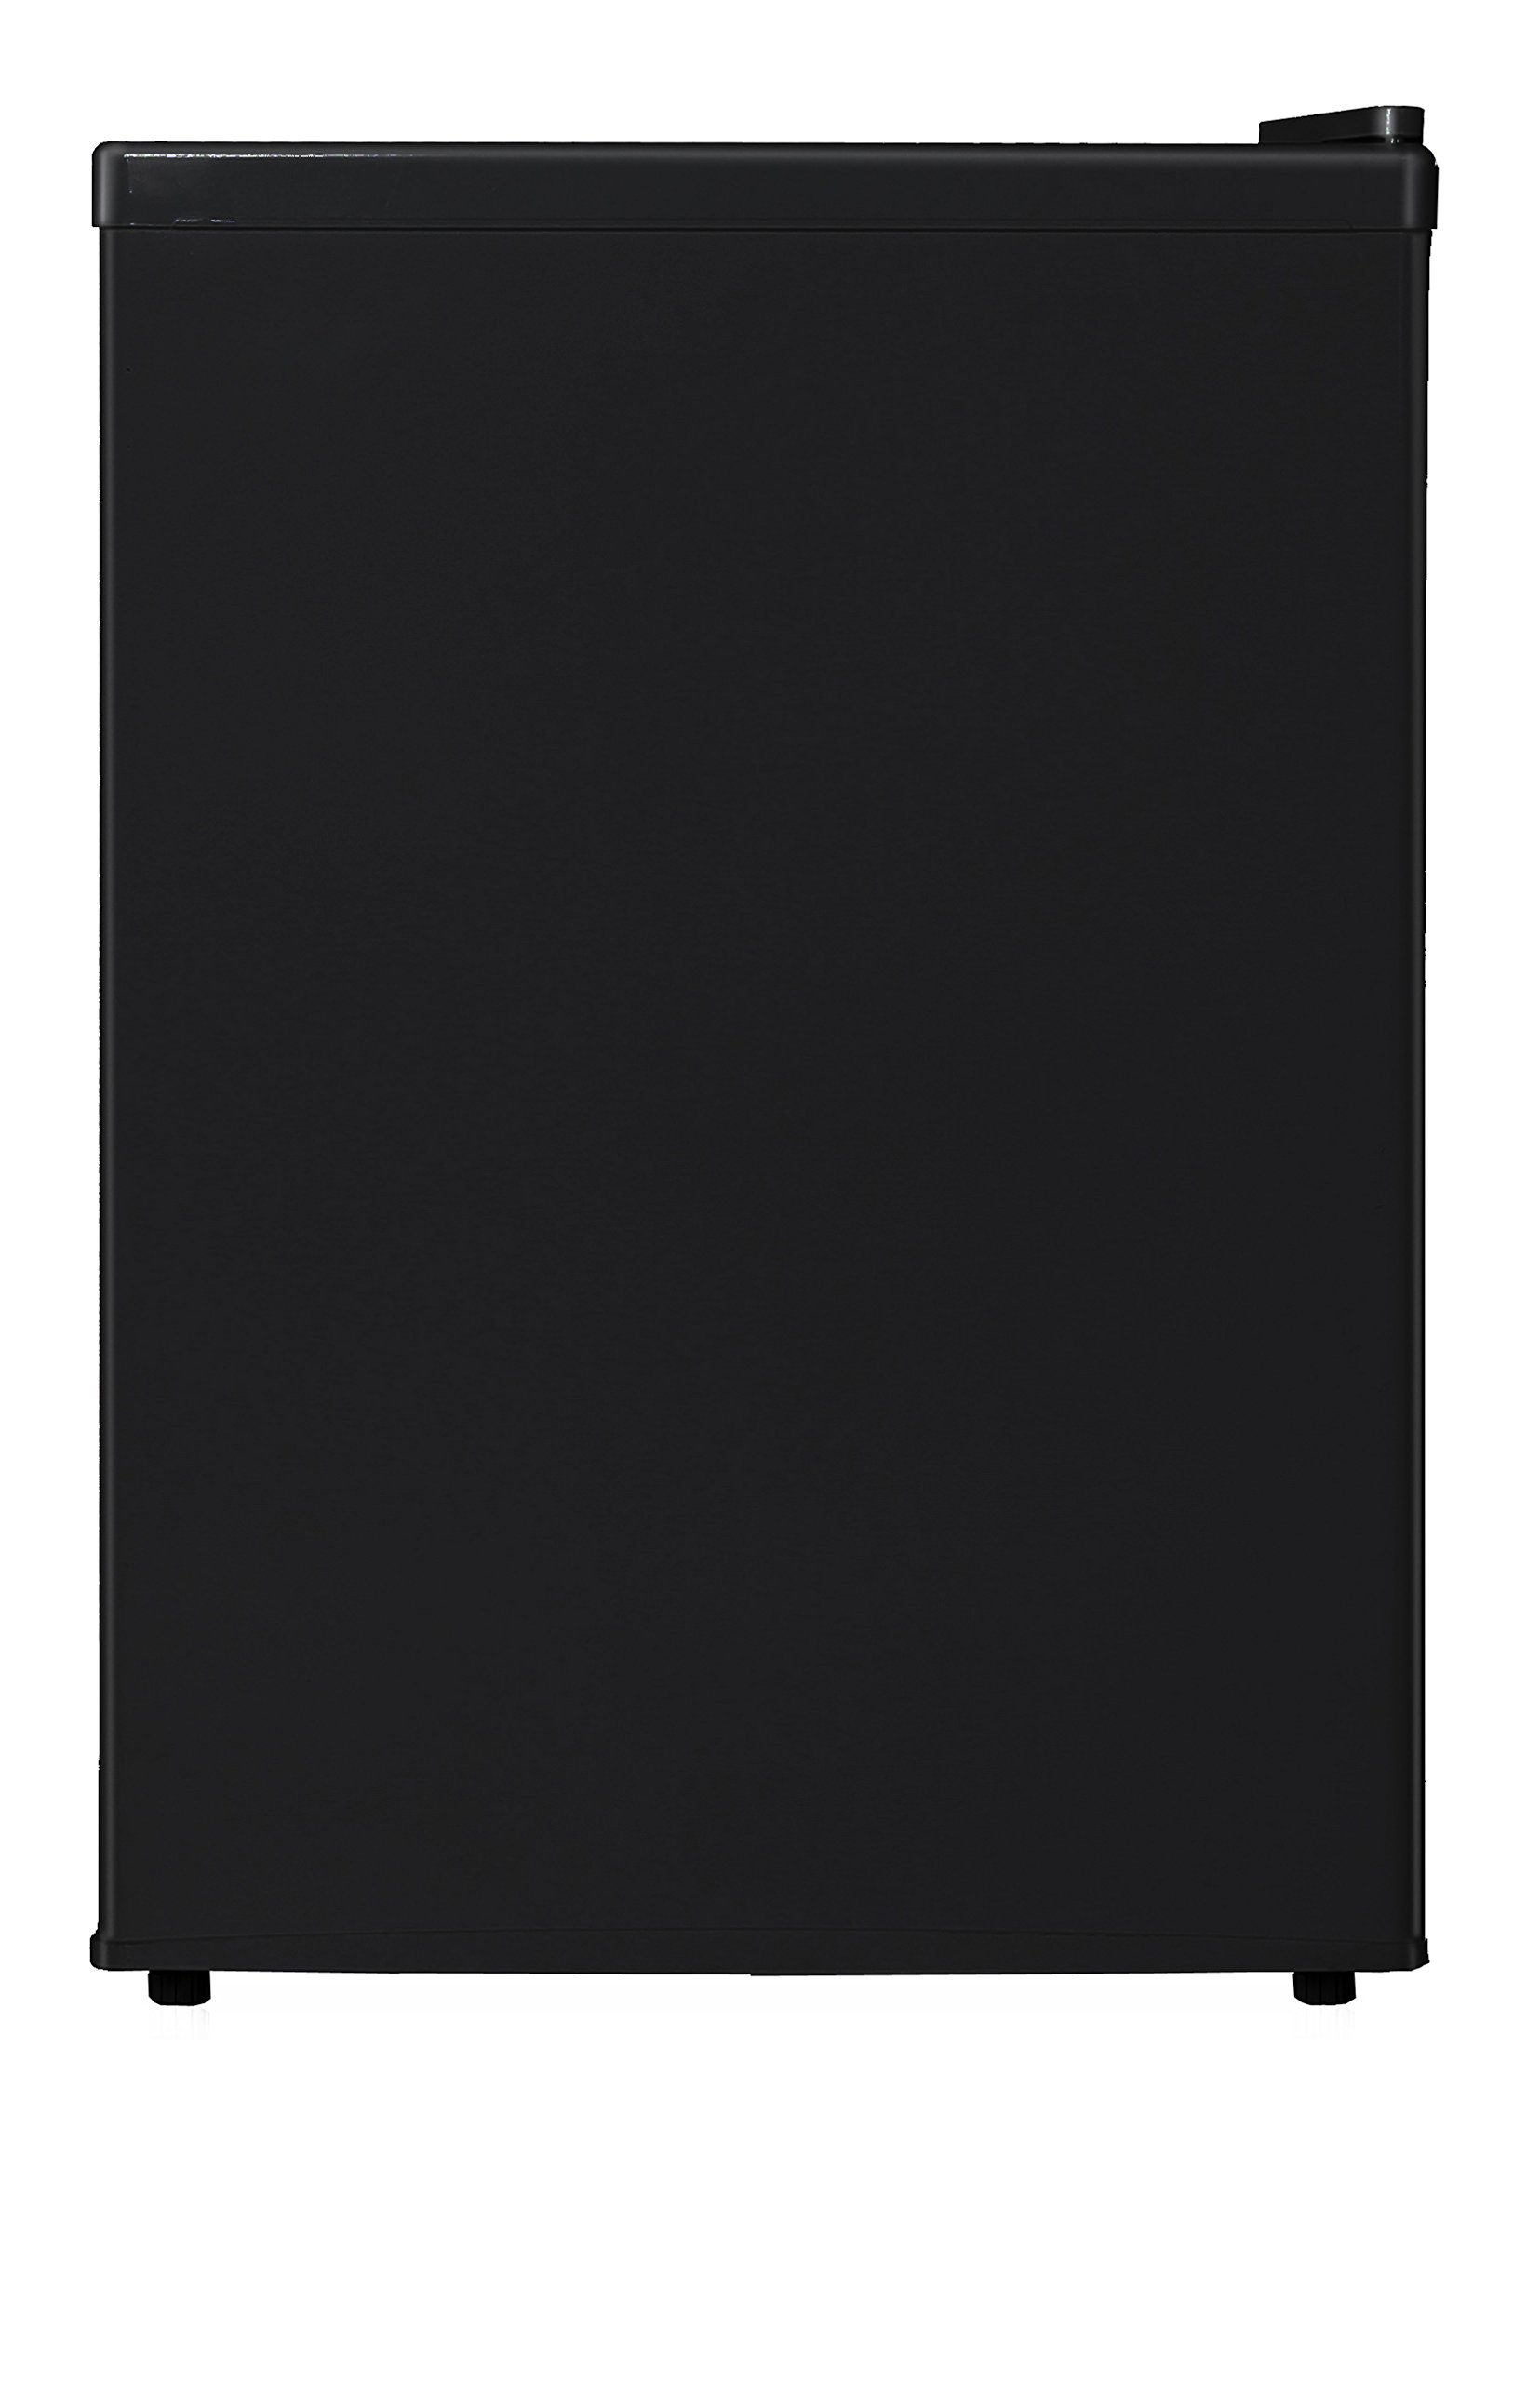 Midea WHS-87LB1 Compact Single Reversible Door Refrigerator and Freezer, 2.4 Cubic Feet, Black